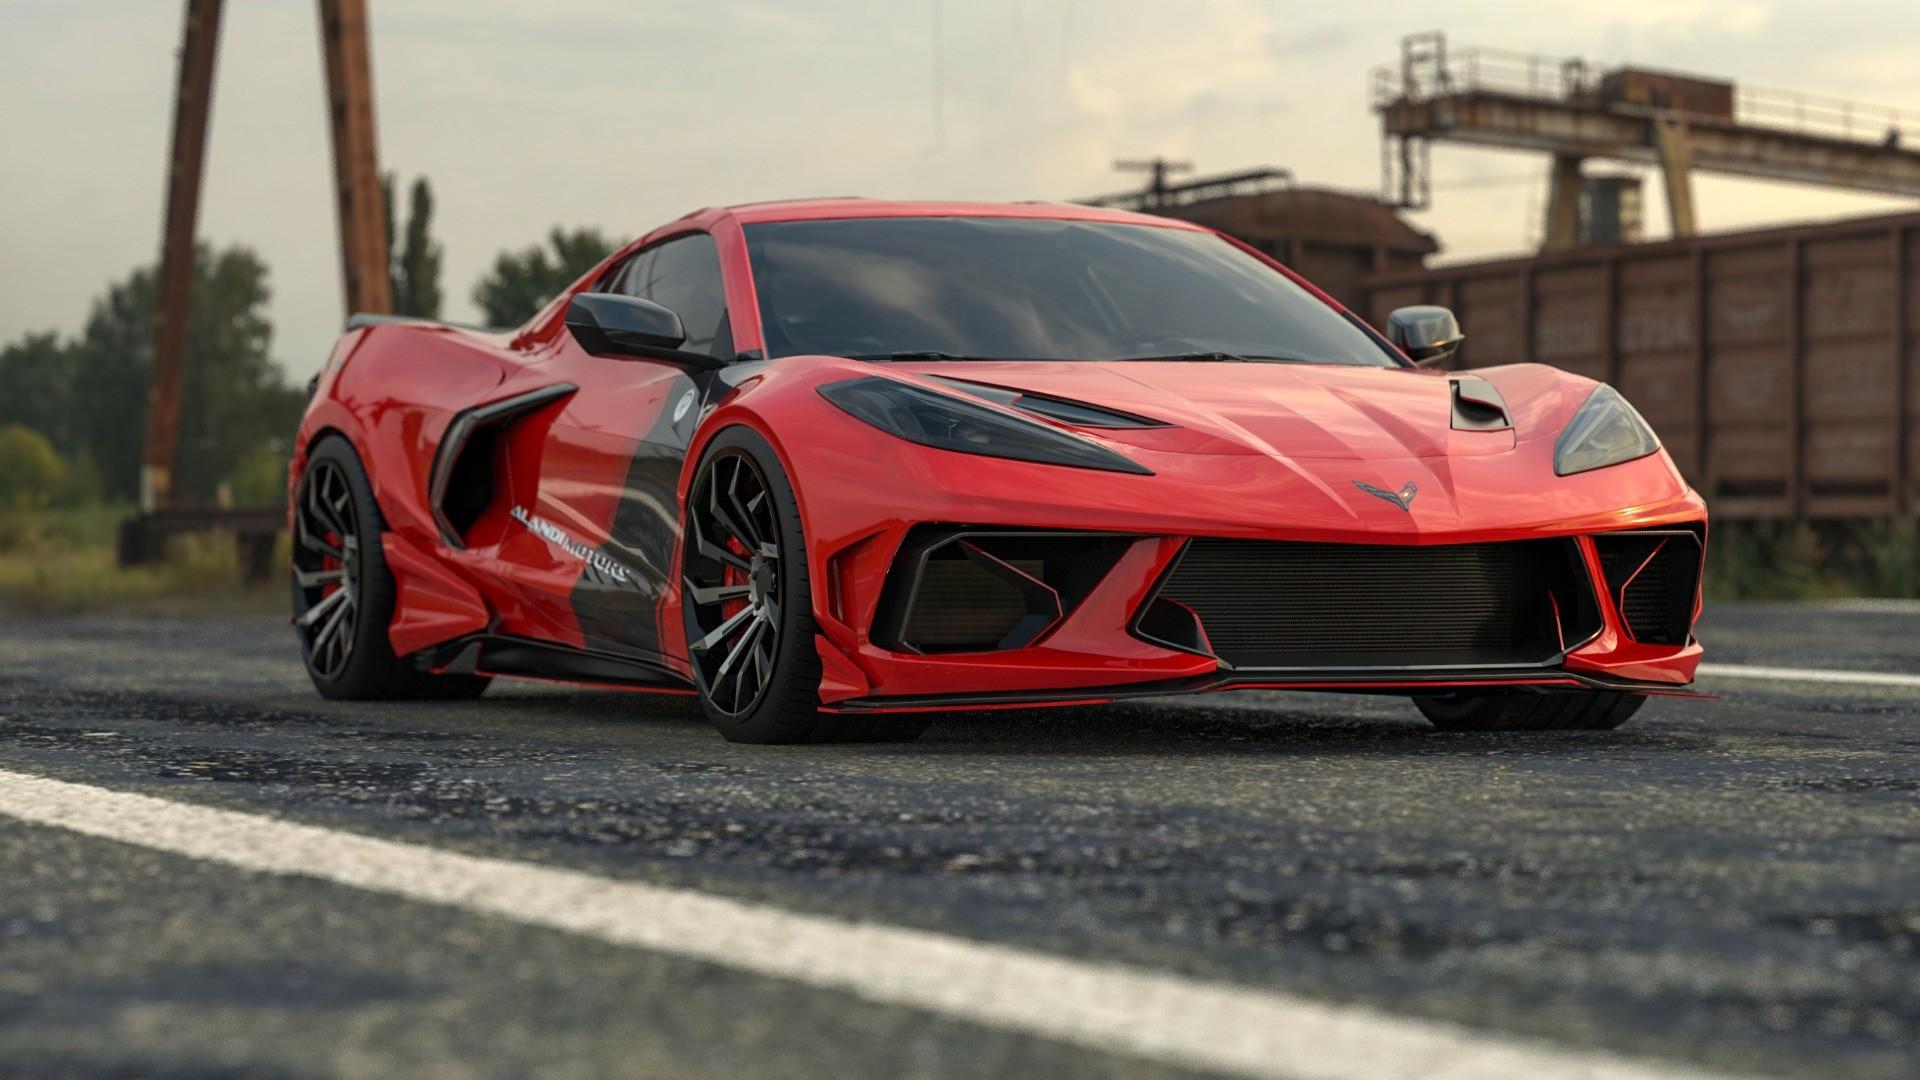 Chevrolet-Corvette-Centurion-by-Alandi-Motors-1